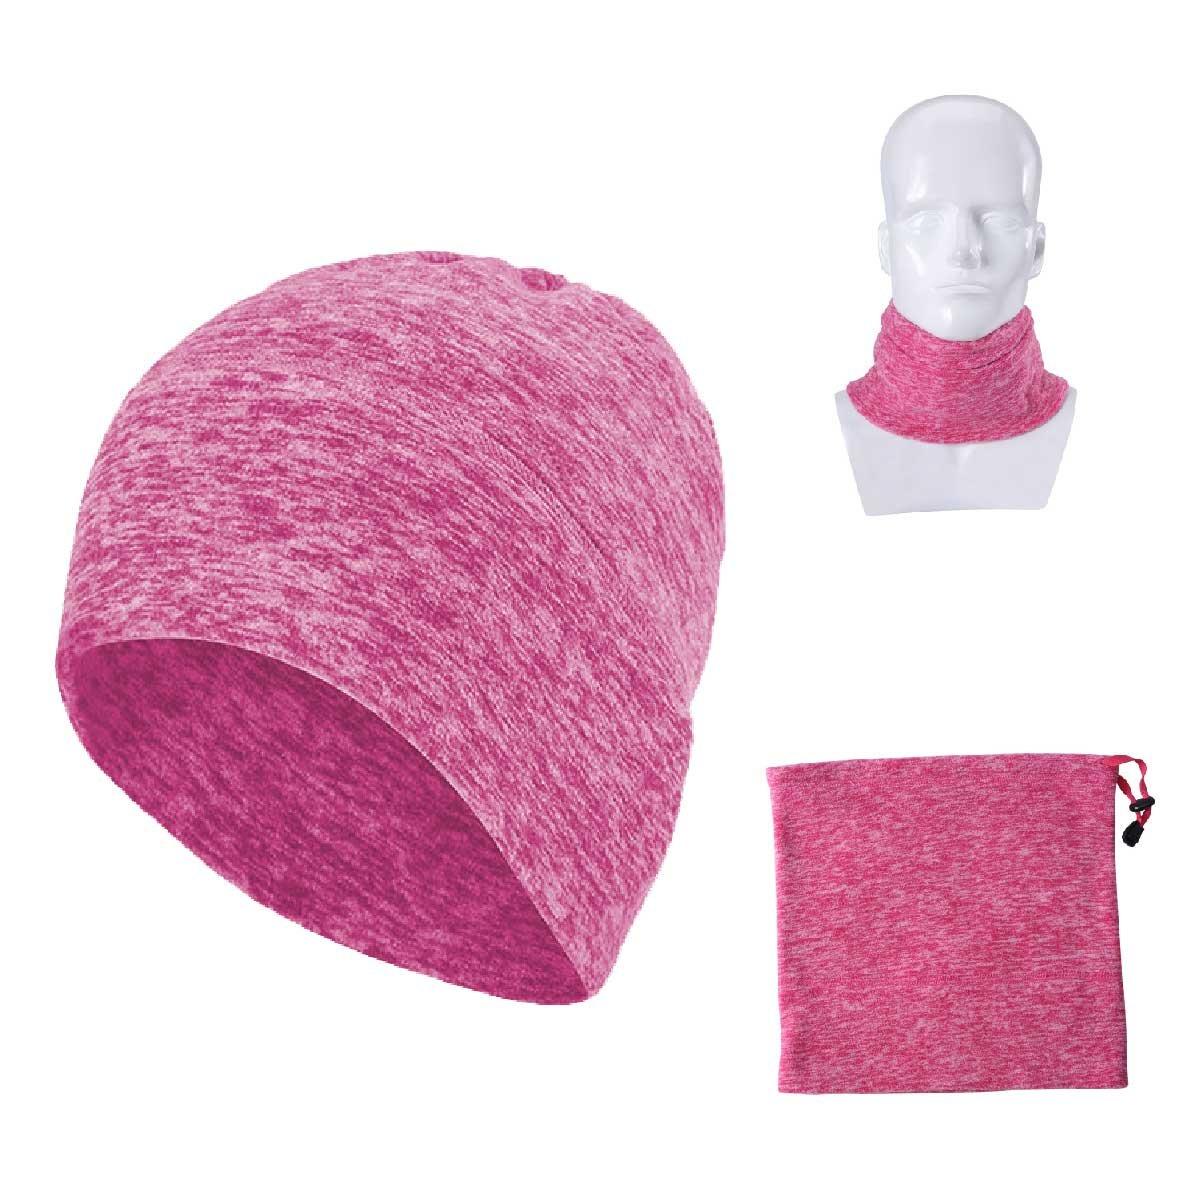 Triwonder Neck Warmer, Outdoor Multifunctional Headwear - Magic Scarf, Face Mask, Do Rag, Winter Cap (Black) OS1405BL